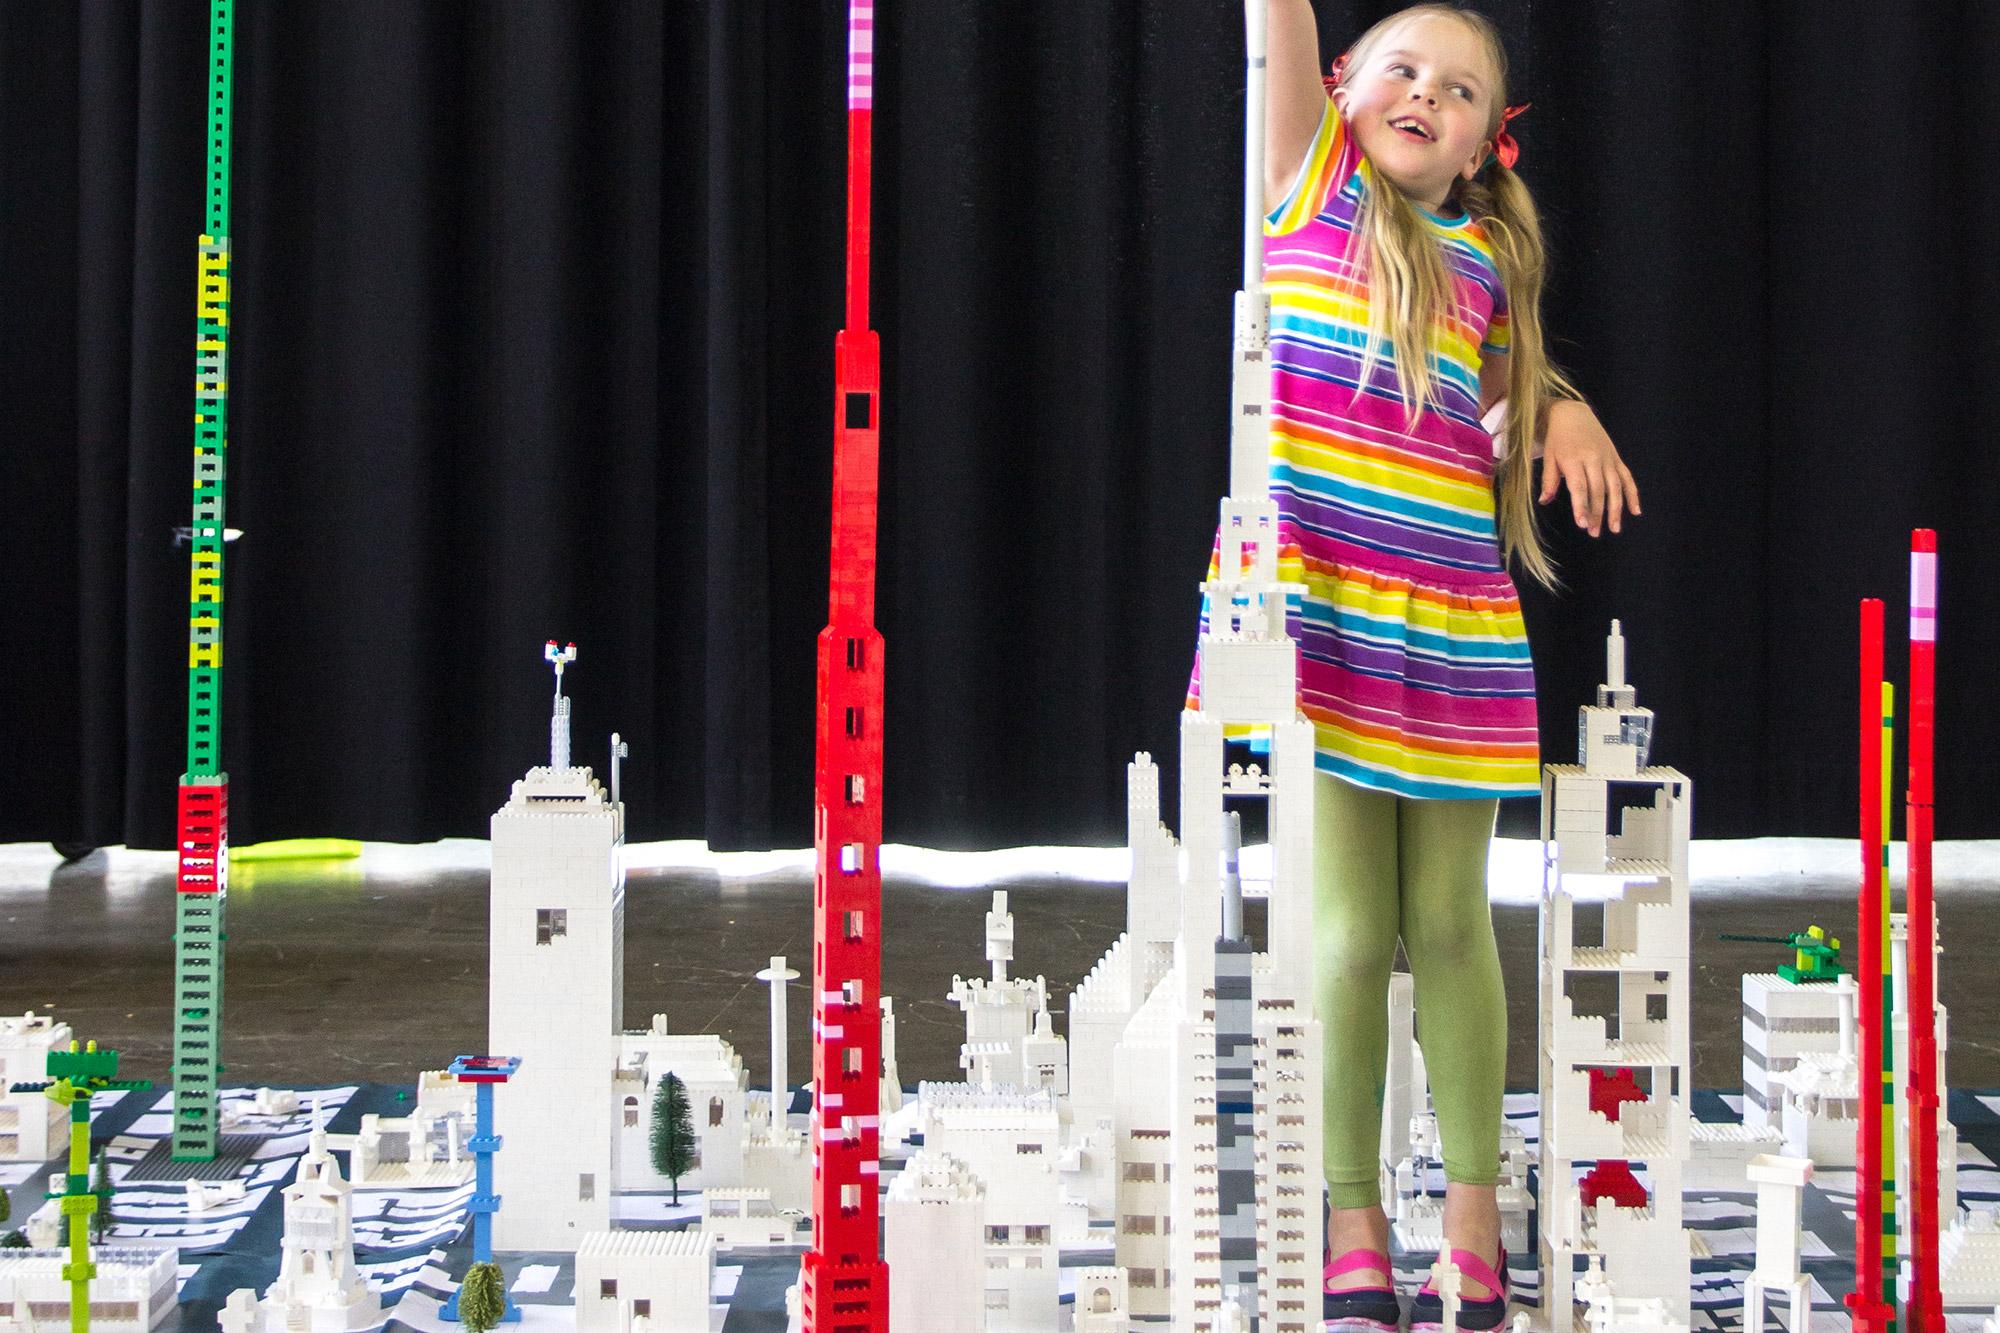 Lego Tower Workshop